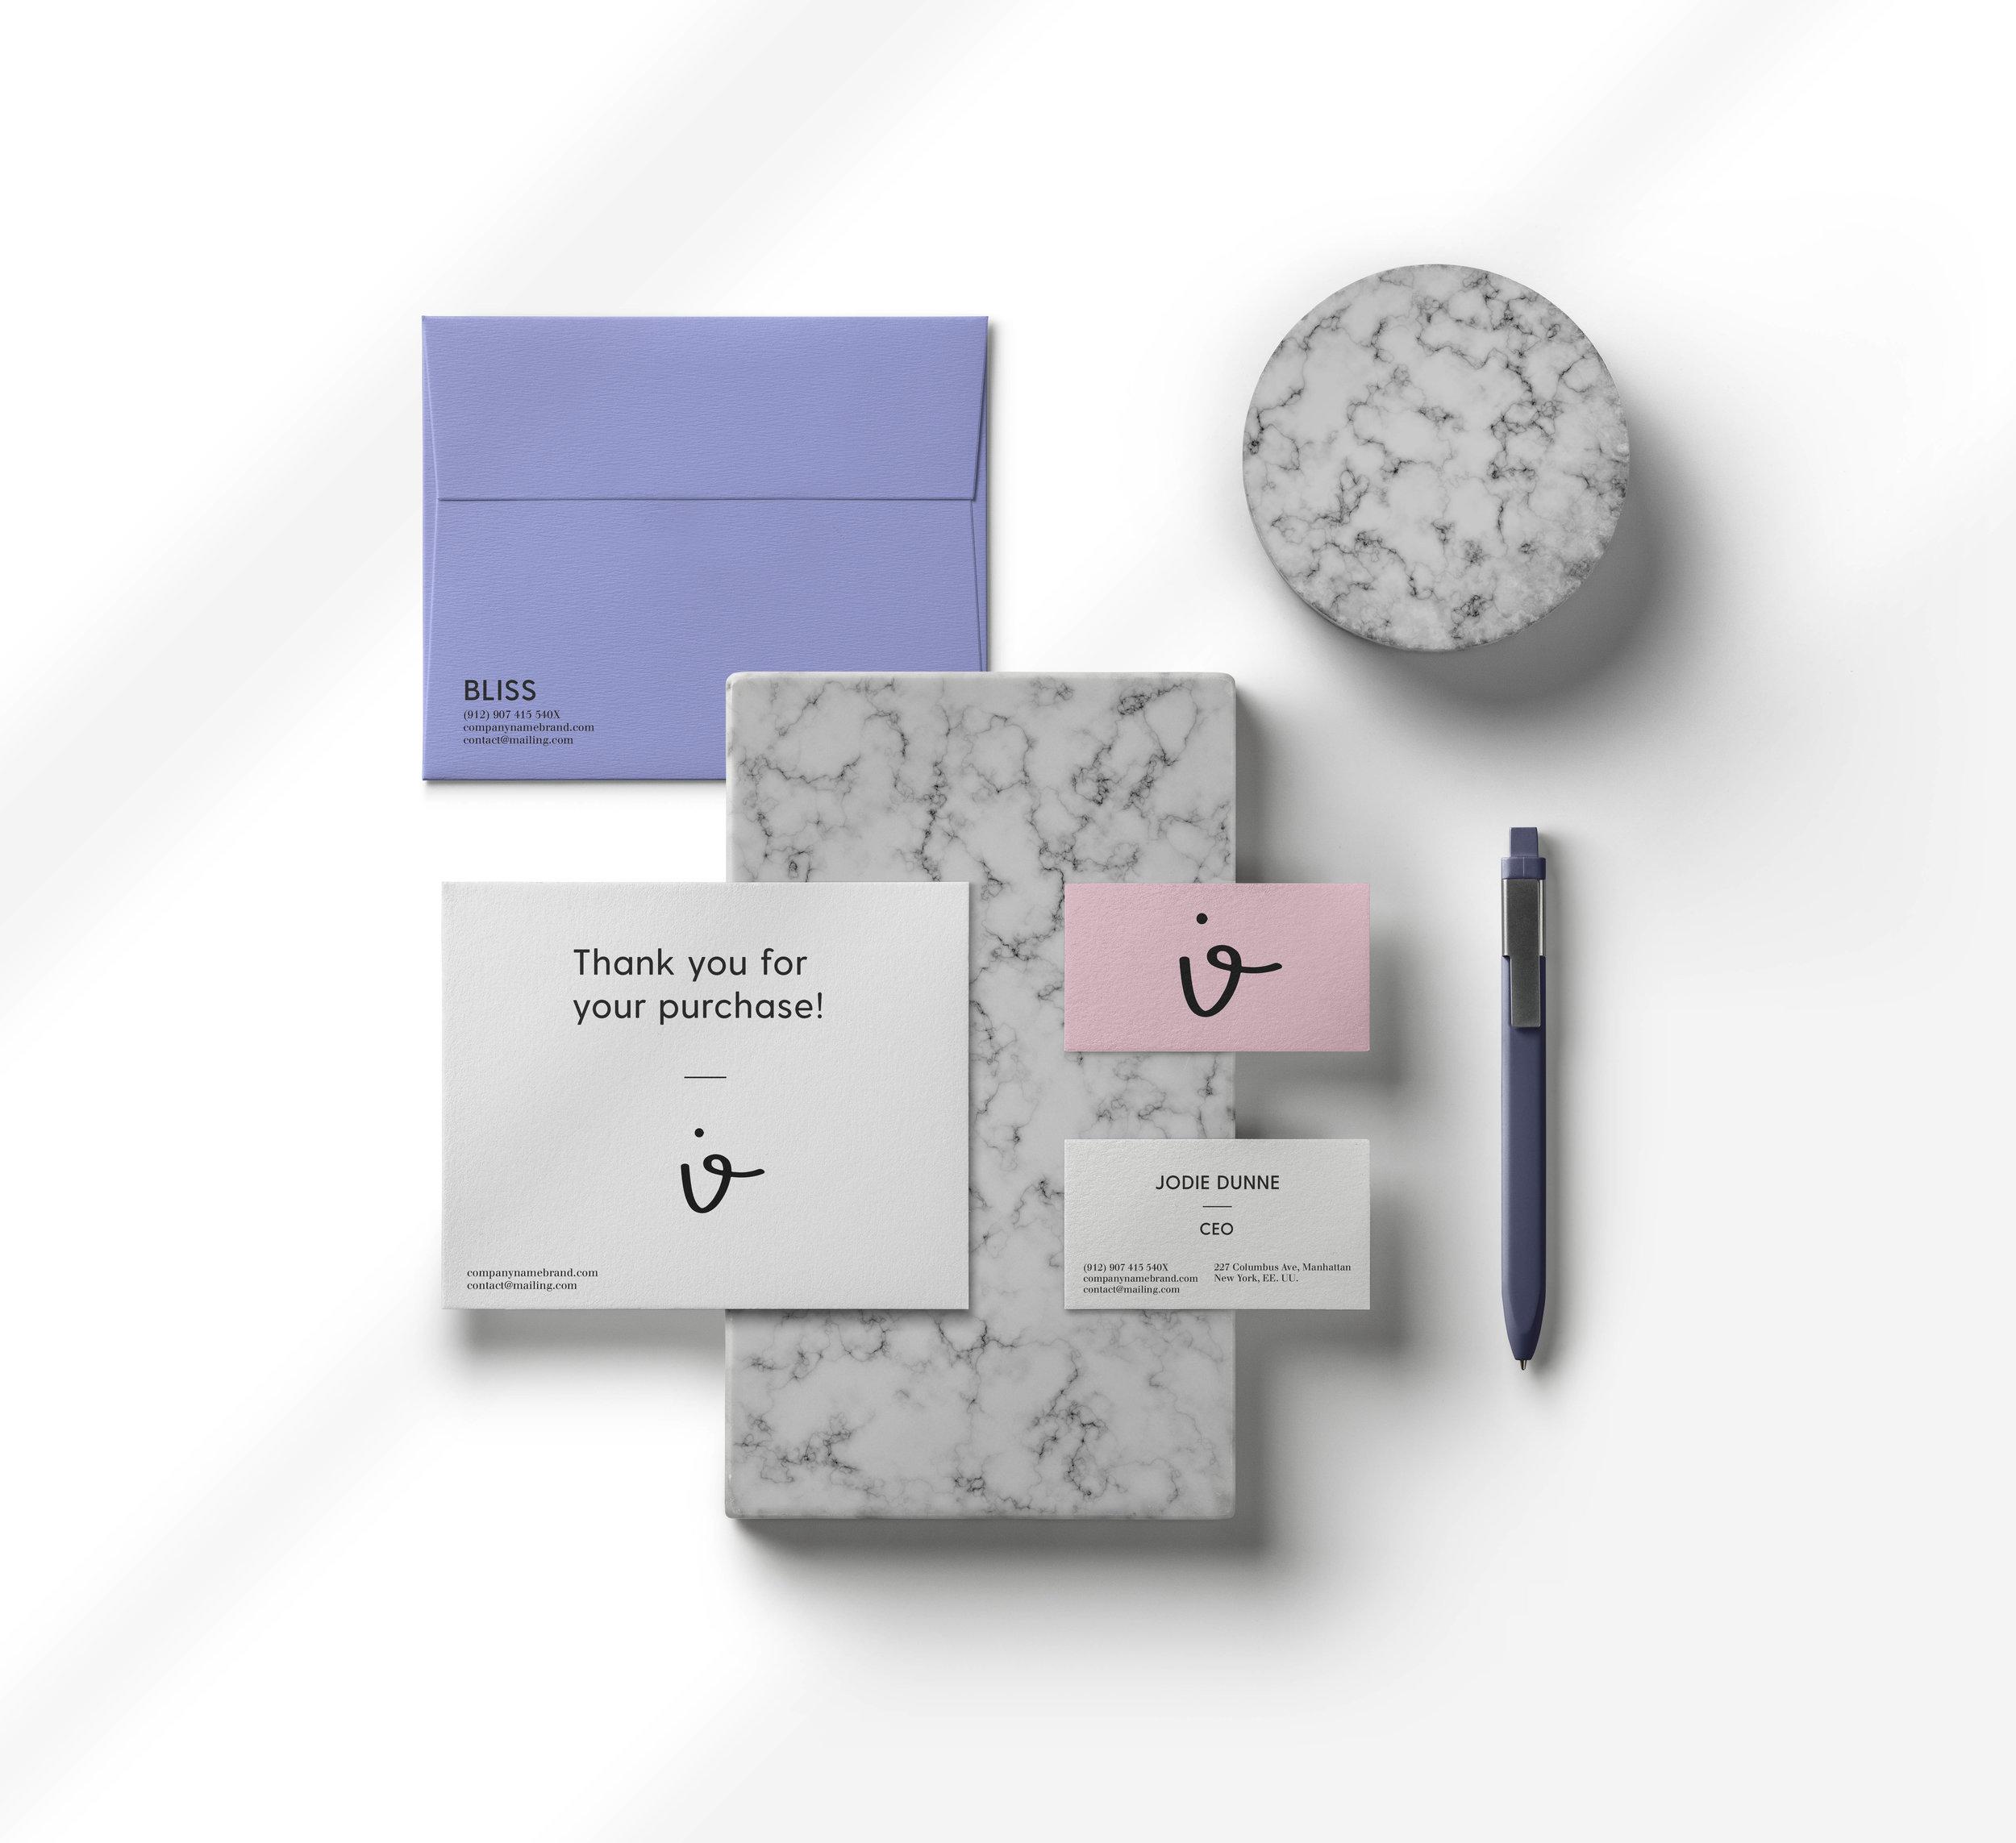 Stationery-Branding-Mockup-Vol32.jpg